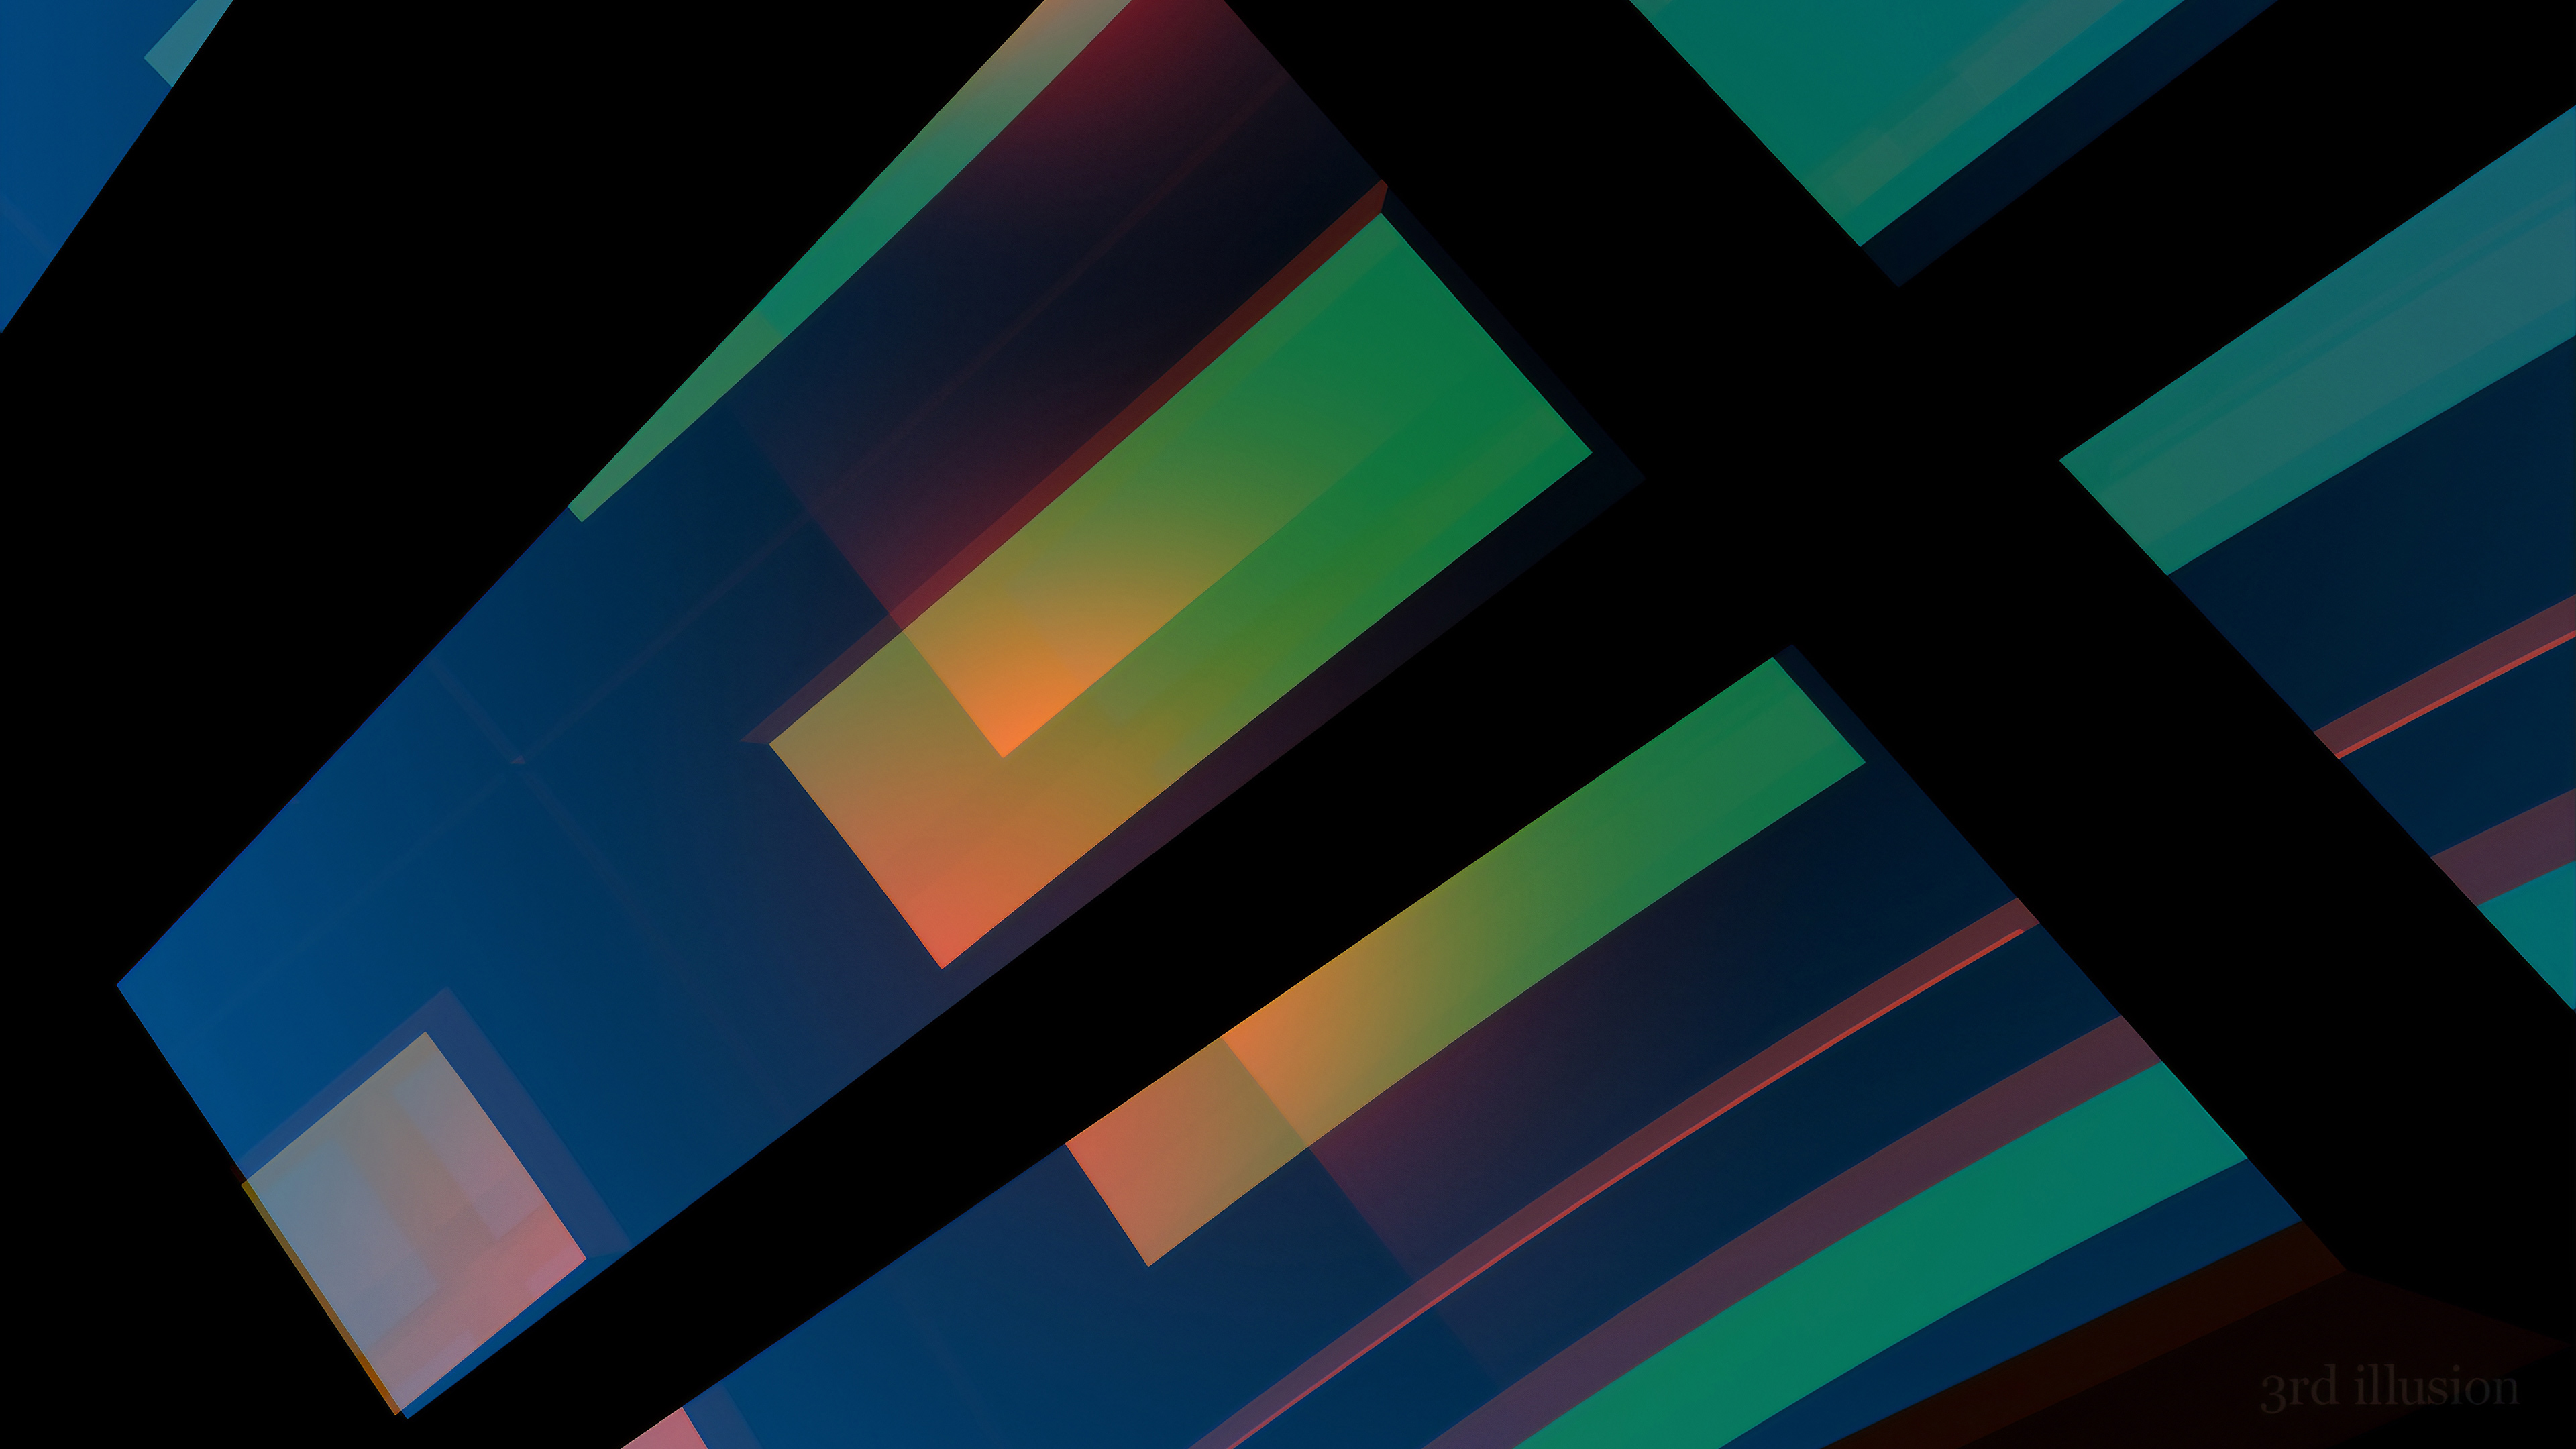 fragments 1570394948 - Fragments - hd-wallpapers, digital art wallpapers, deviantart wallpapers, artwork wallpapers, artist wallpapers, abstract wallpapers, 4k-wallpapers